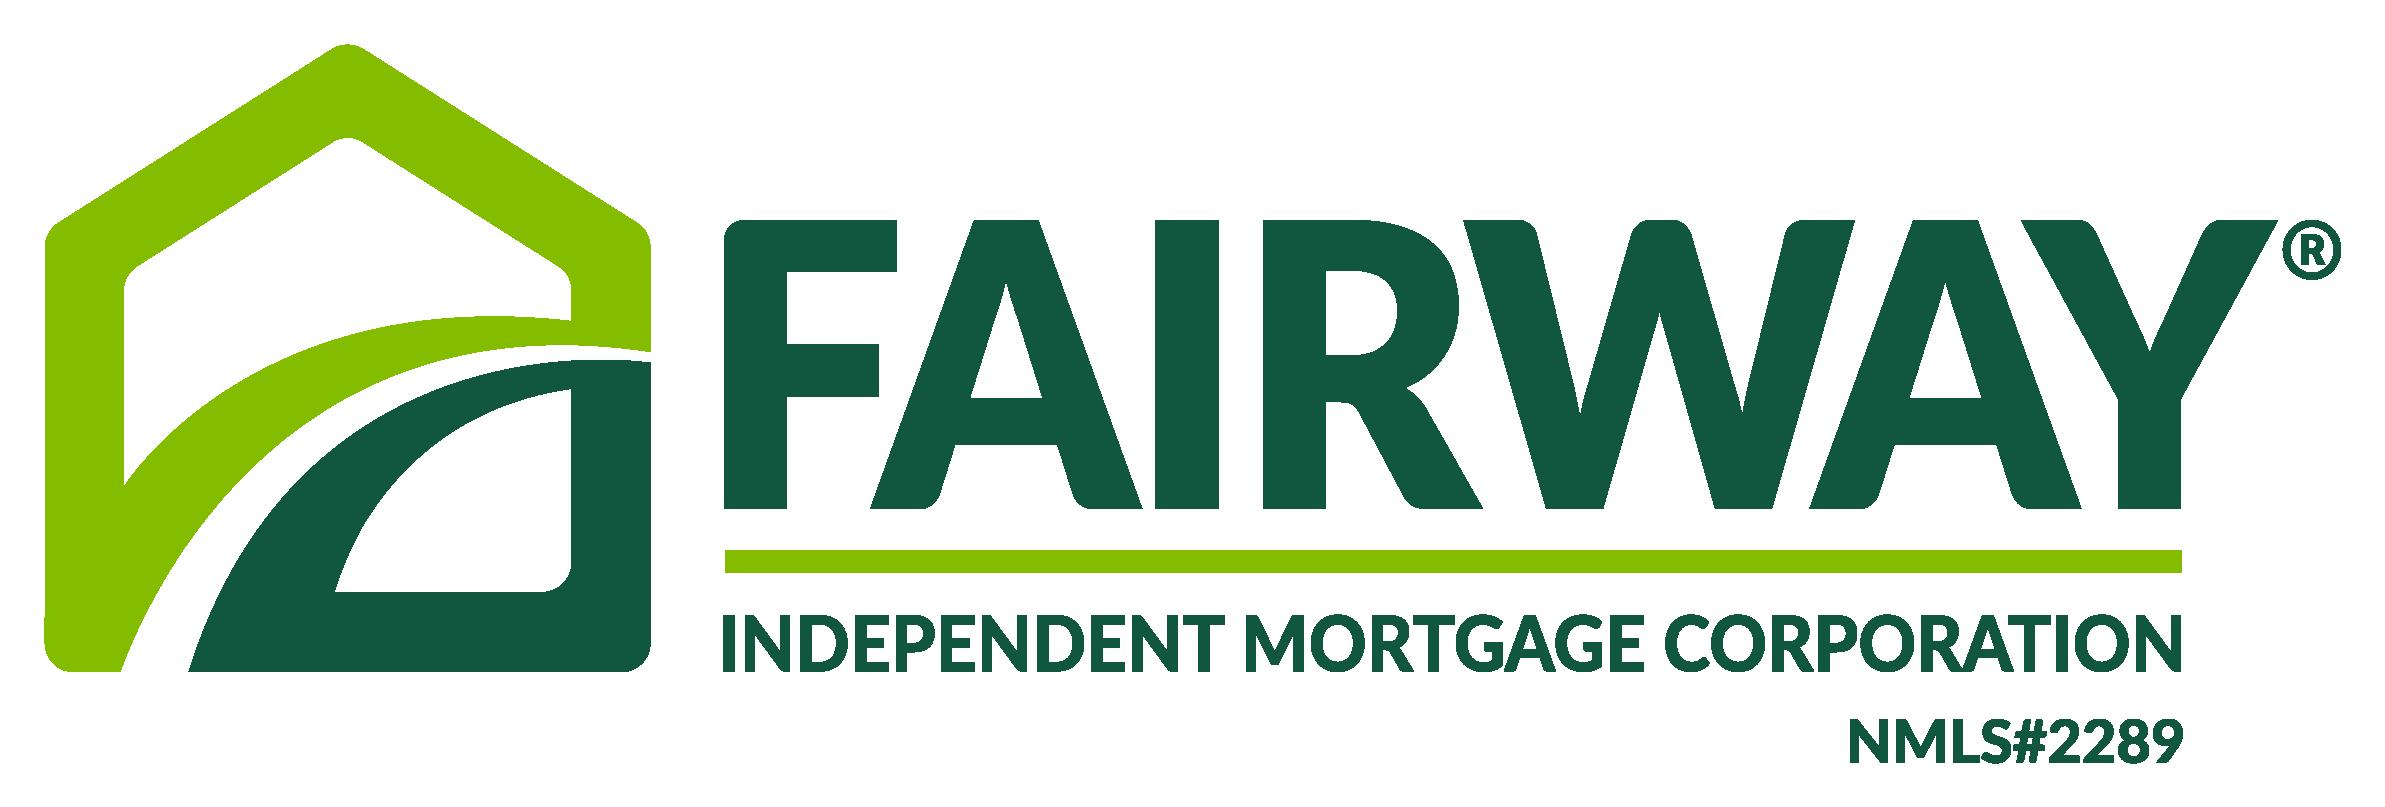 Fairway logo.